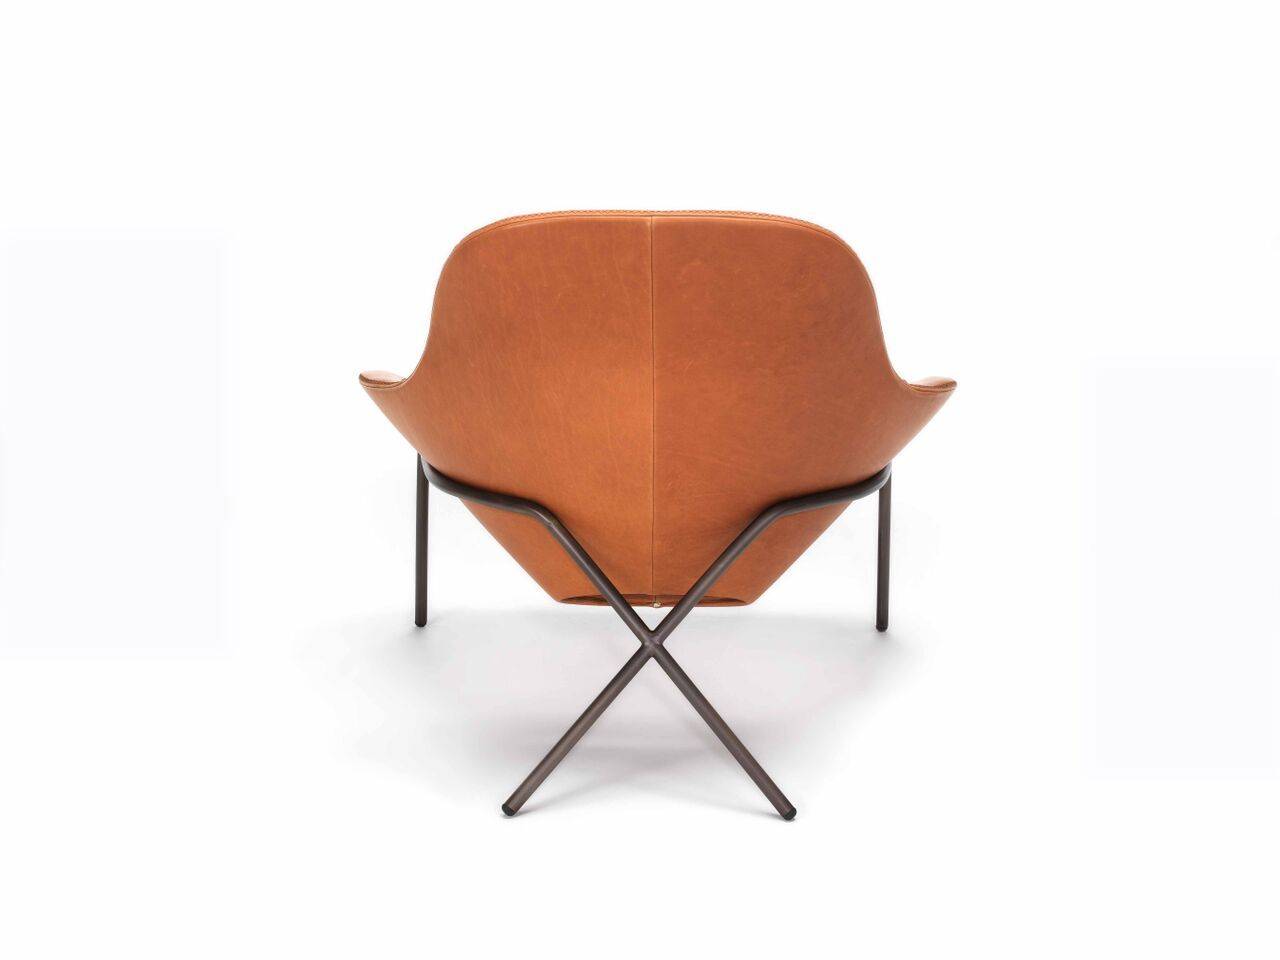 Comfortable Leather Lounge Chair Cross Leg Chair By Magnus Long Leather Lounge Chair Chair Leather Chair